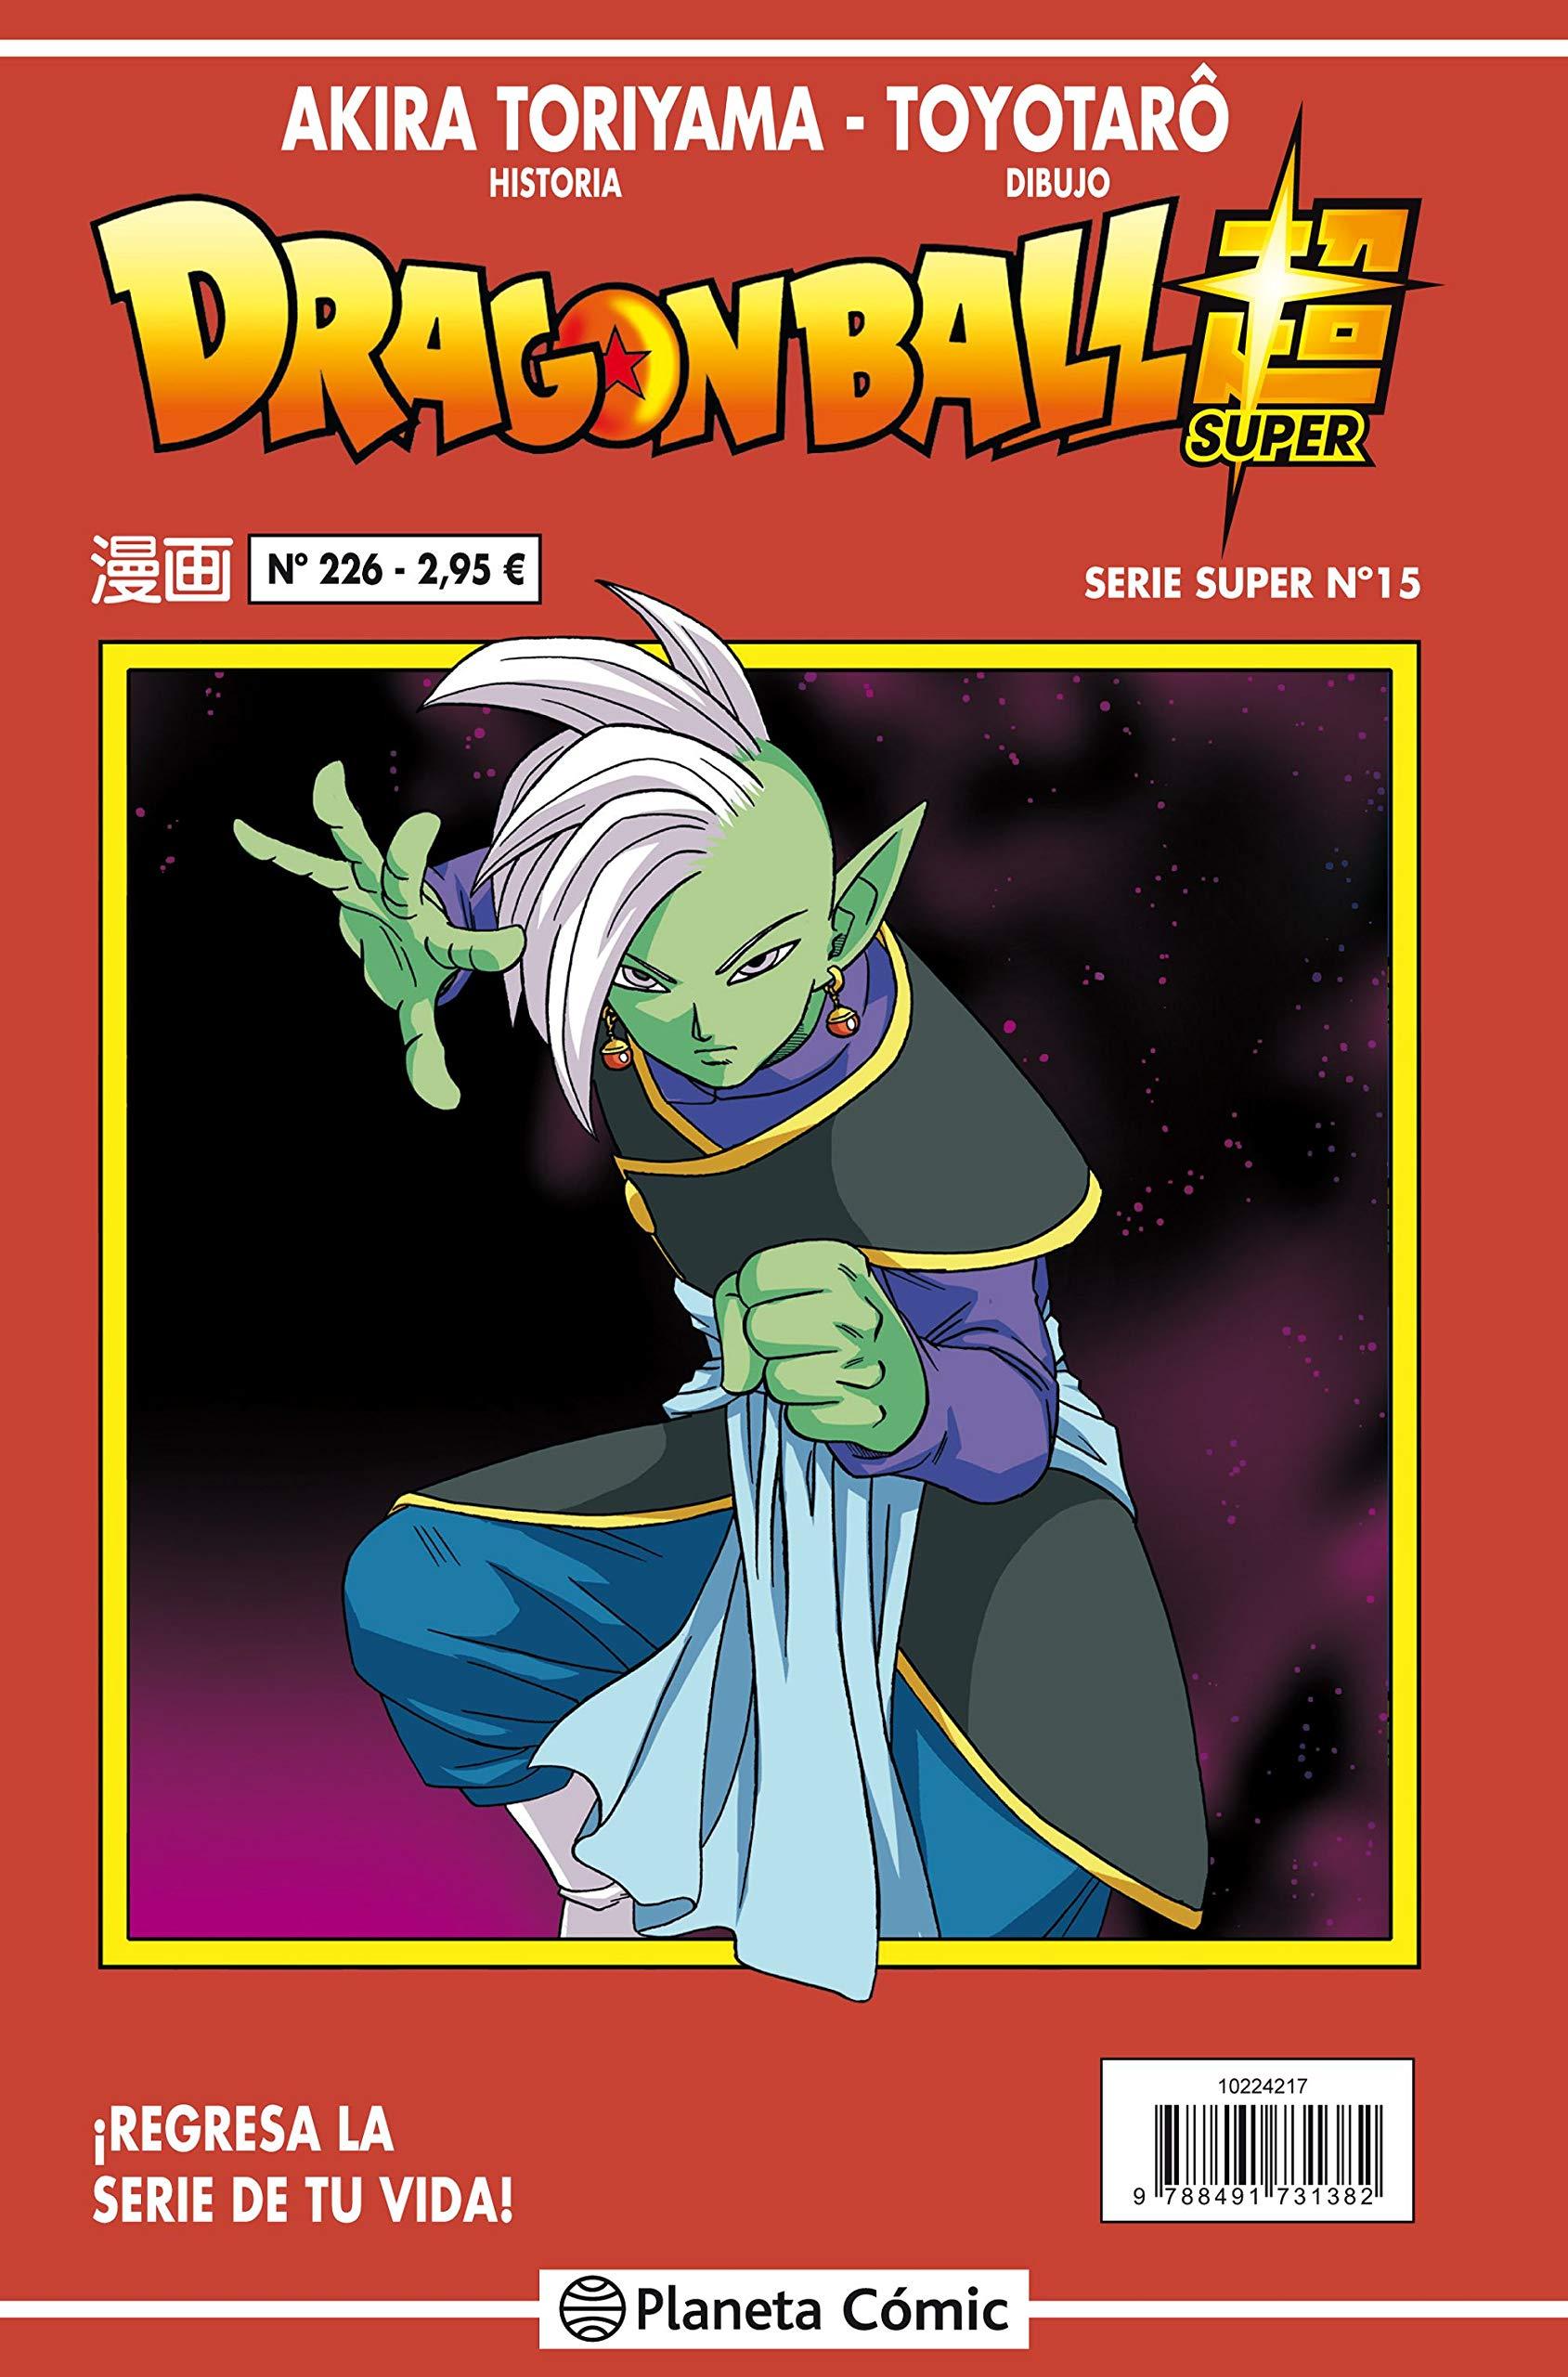 Dragon Ball Serie roja nº 226 (Manga Shonen) Tapa blanda – 27 nov 2018 Akira Toriyama Daruma Planeta DeAgostini Cómics 8491731385